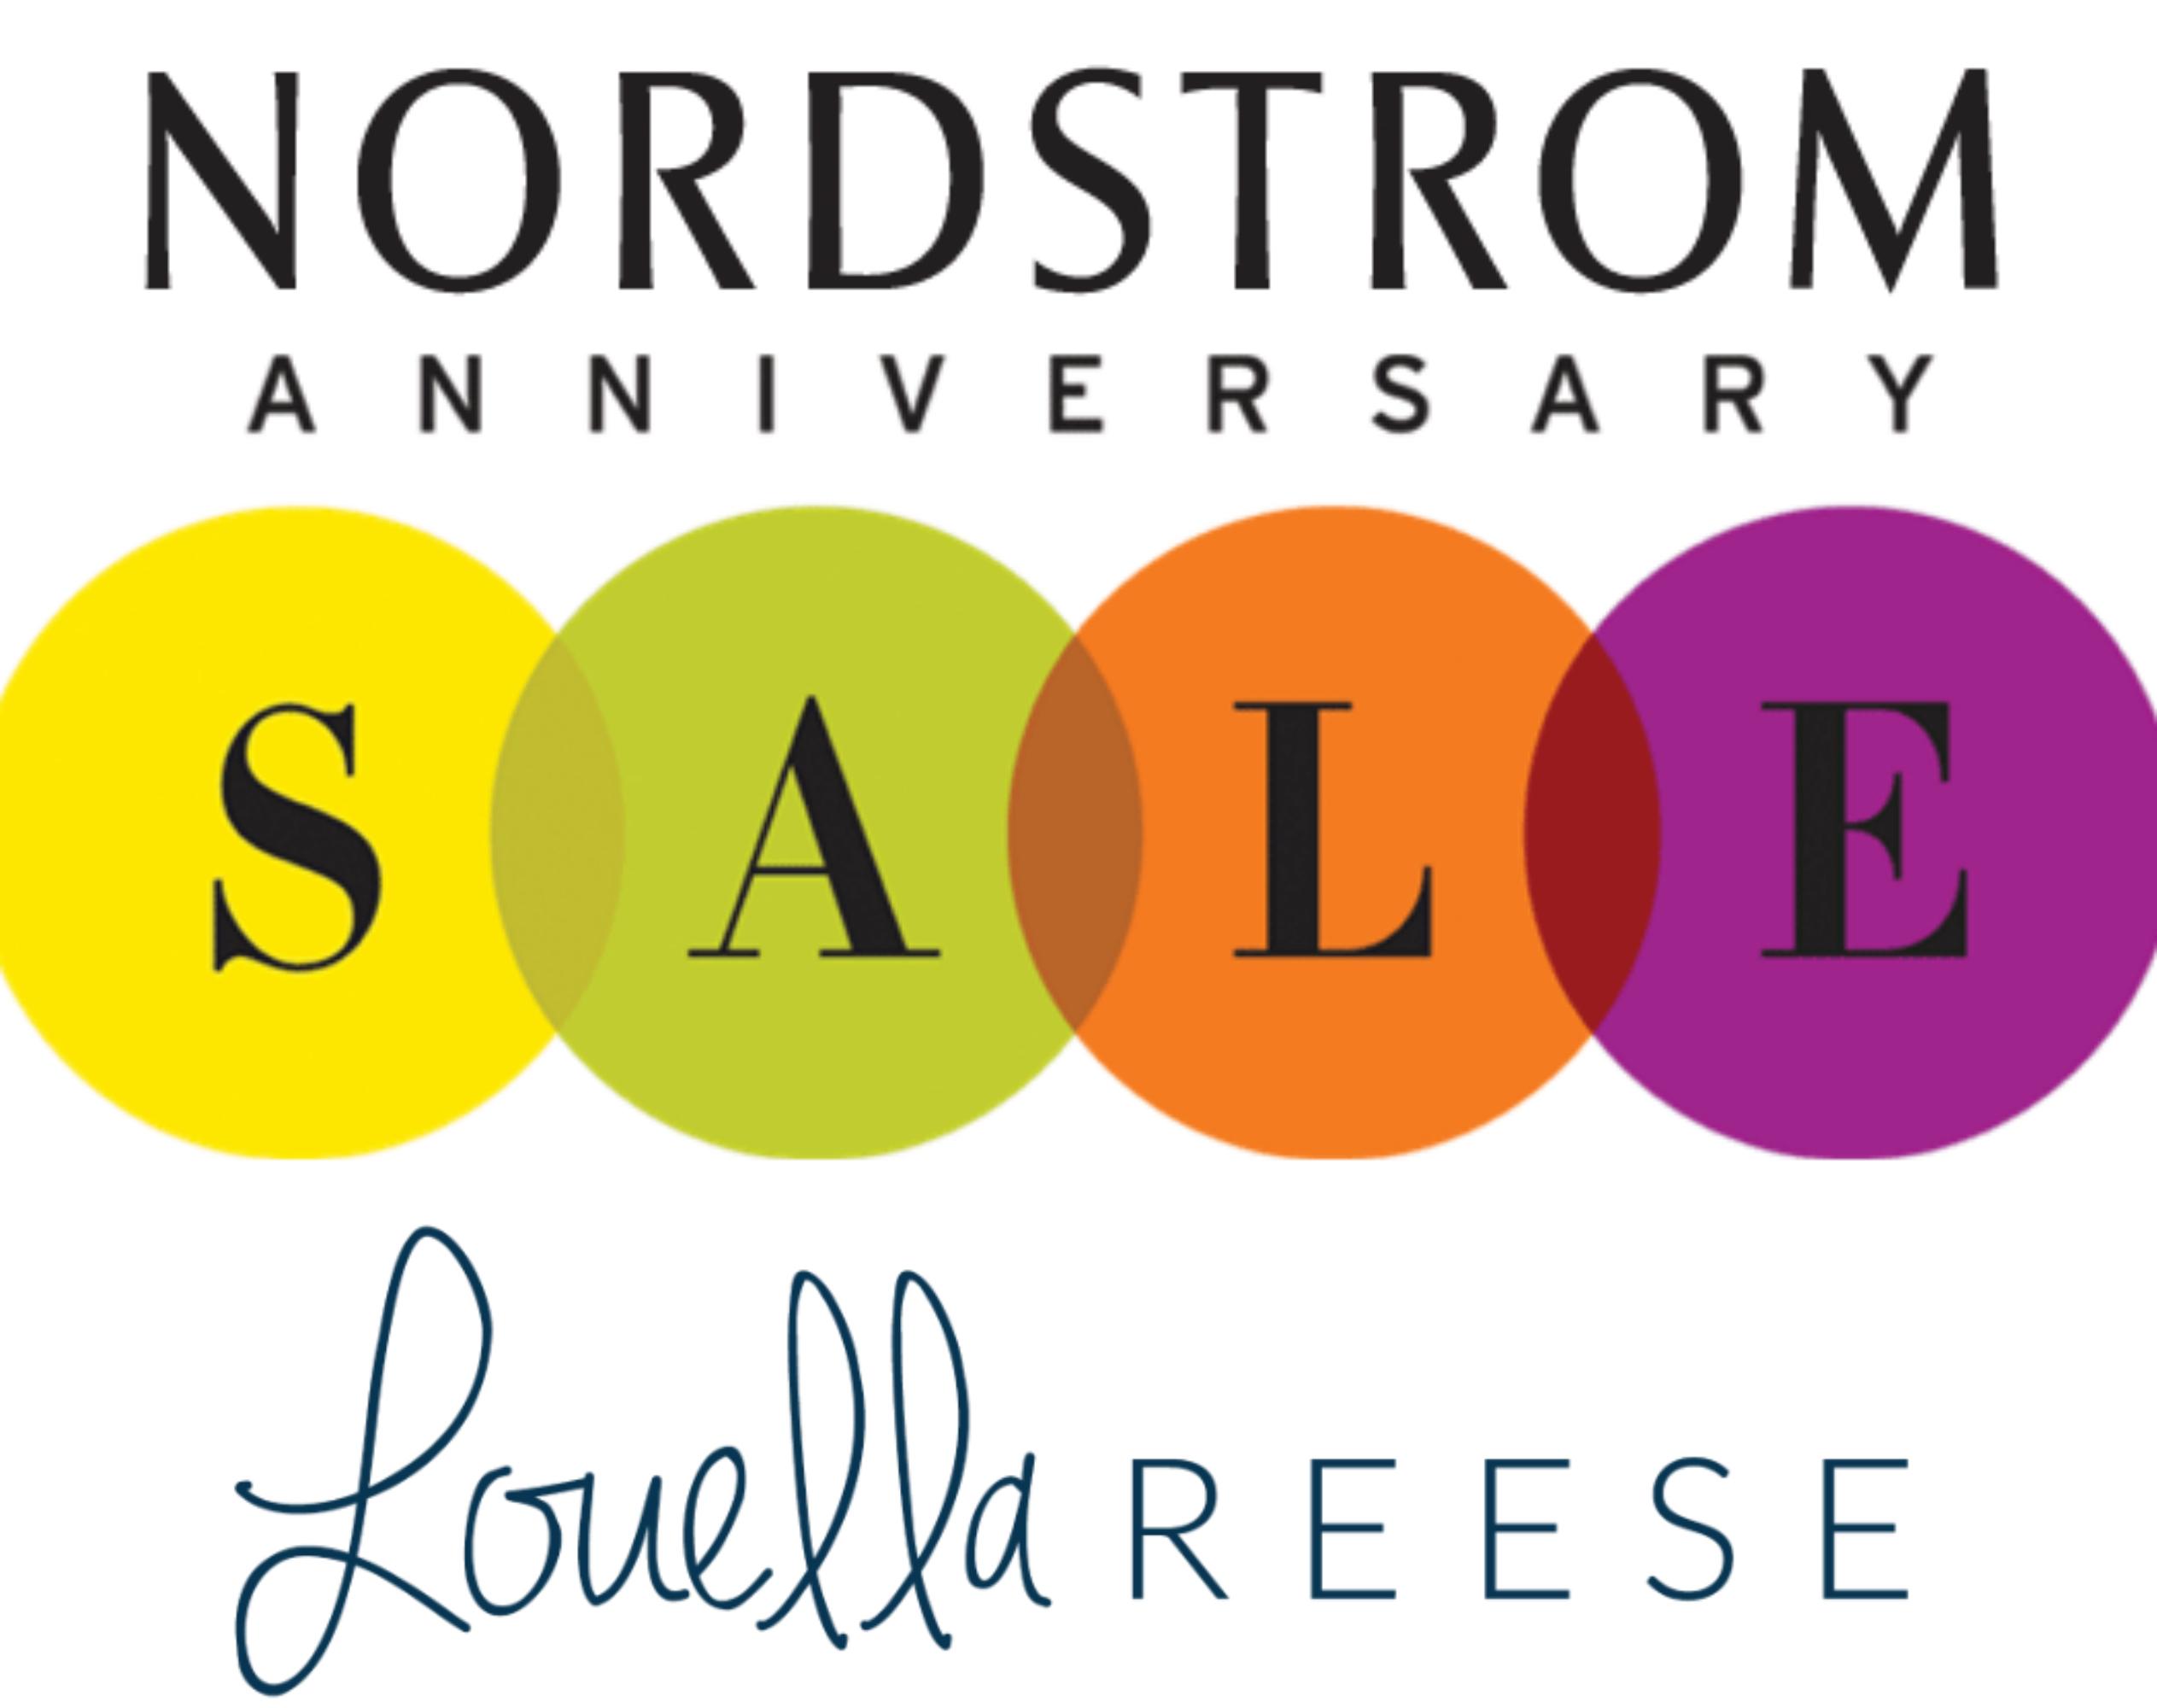 Nordstrom Anniversary Sale 2017, Nordstrom Anniversary Sale Dates, Nordstrom Anniversary Sale Bloggers